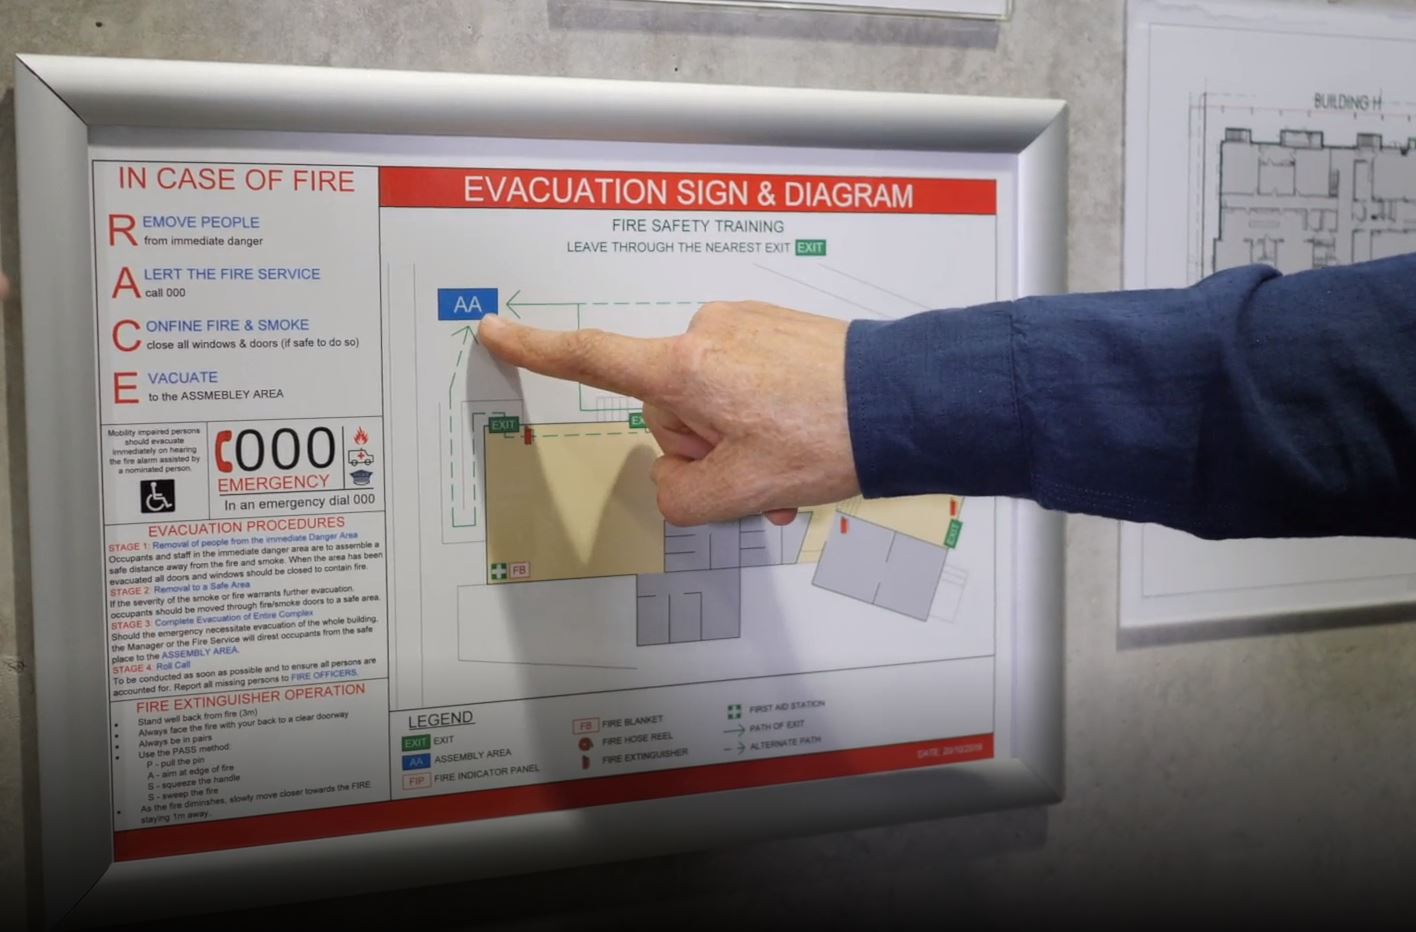 EvacDiagrams